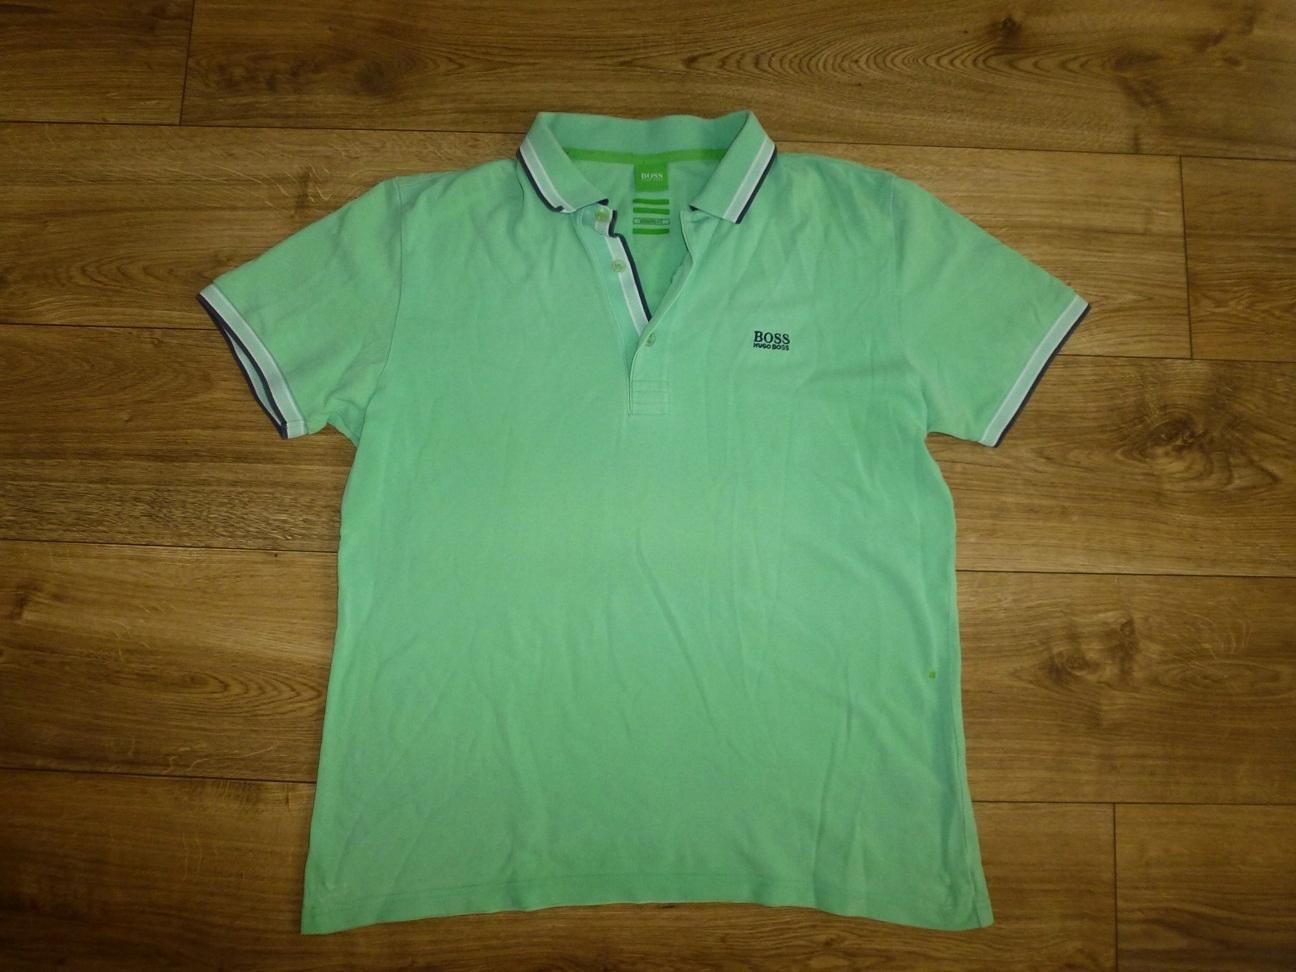 Hugo Boss koszulka polo męska L oryginalna